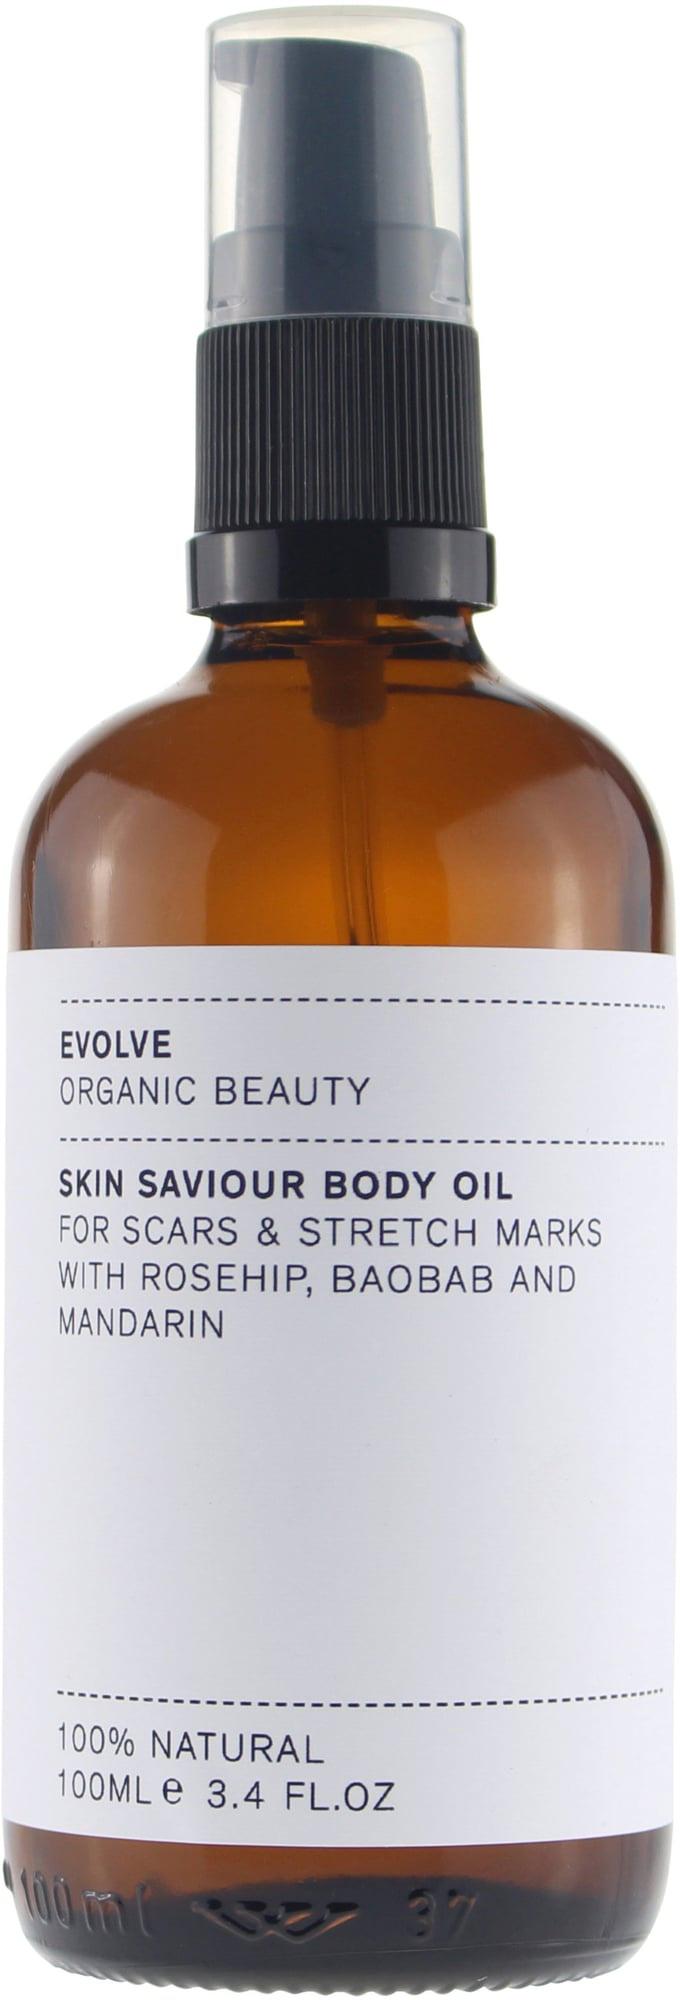 Evolve Organic Beauty Skin Saviour Body Oil